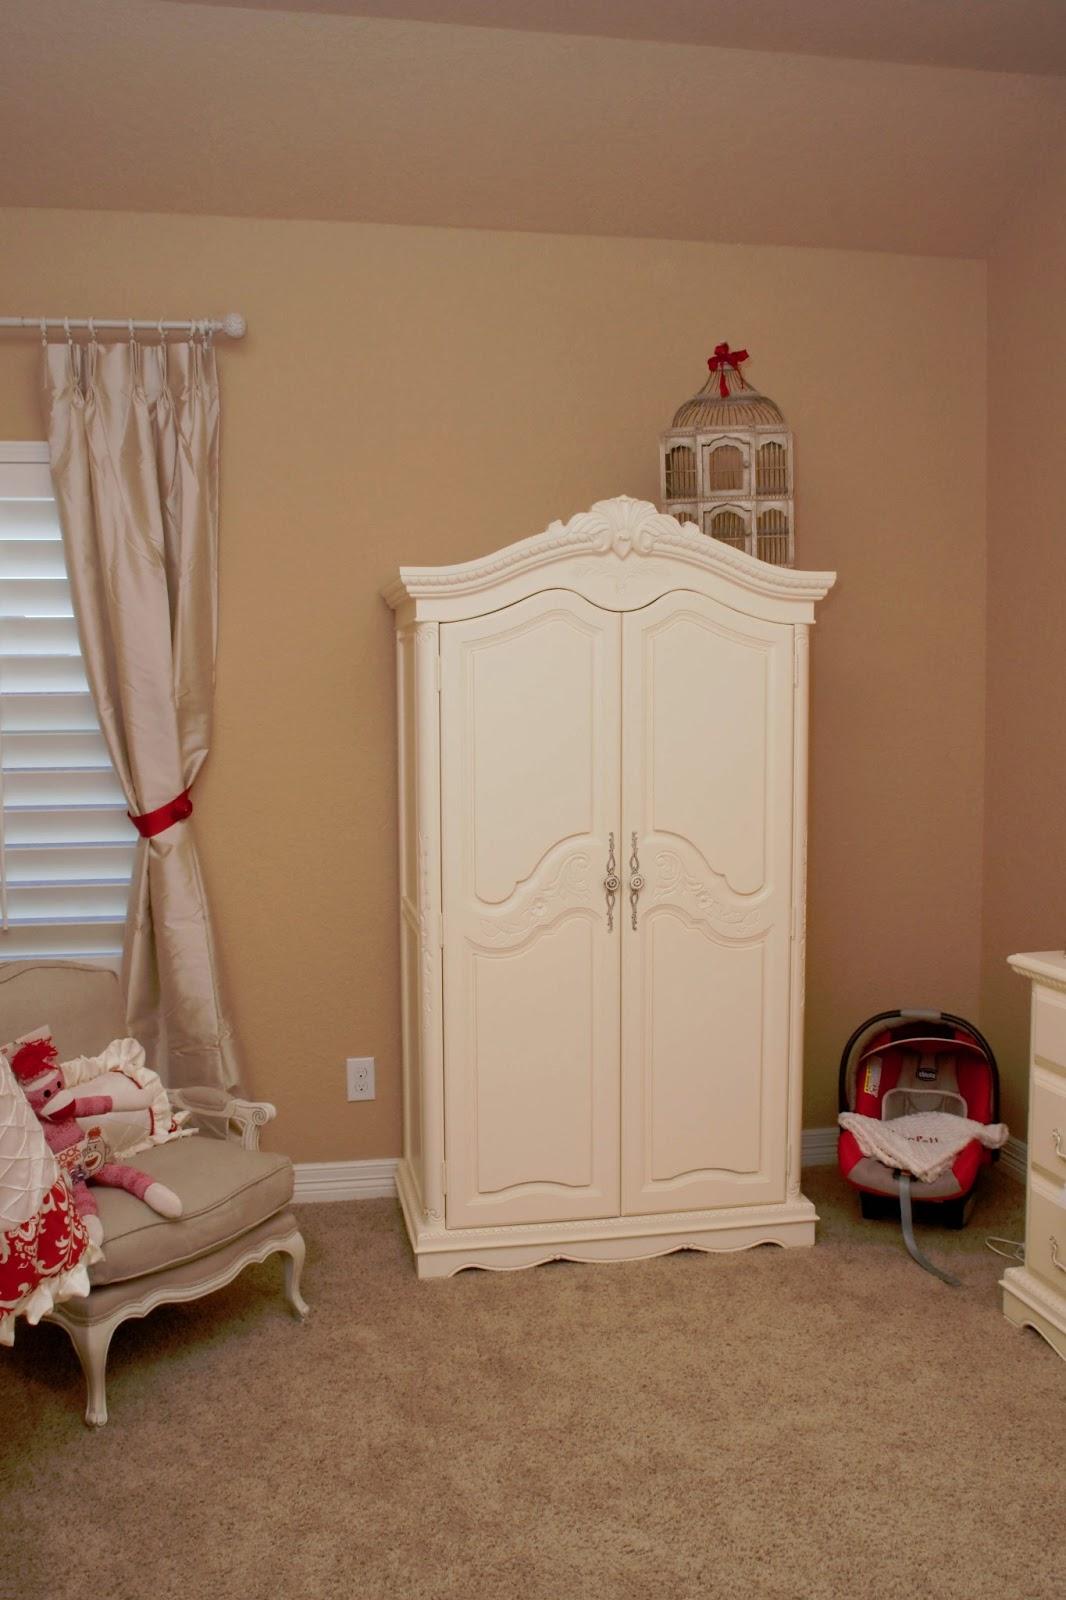 Restoration Hardware Outlet >> The Sweatman Family: Scarlett's Red & Ivory Nursery